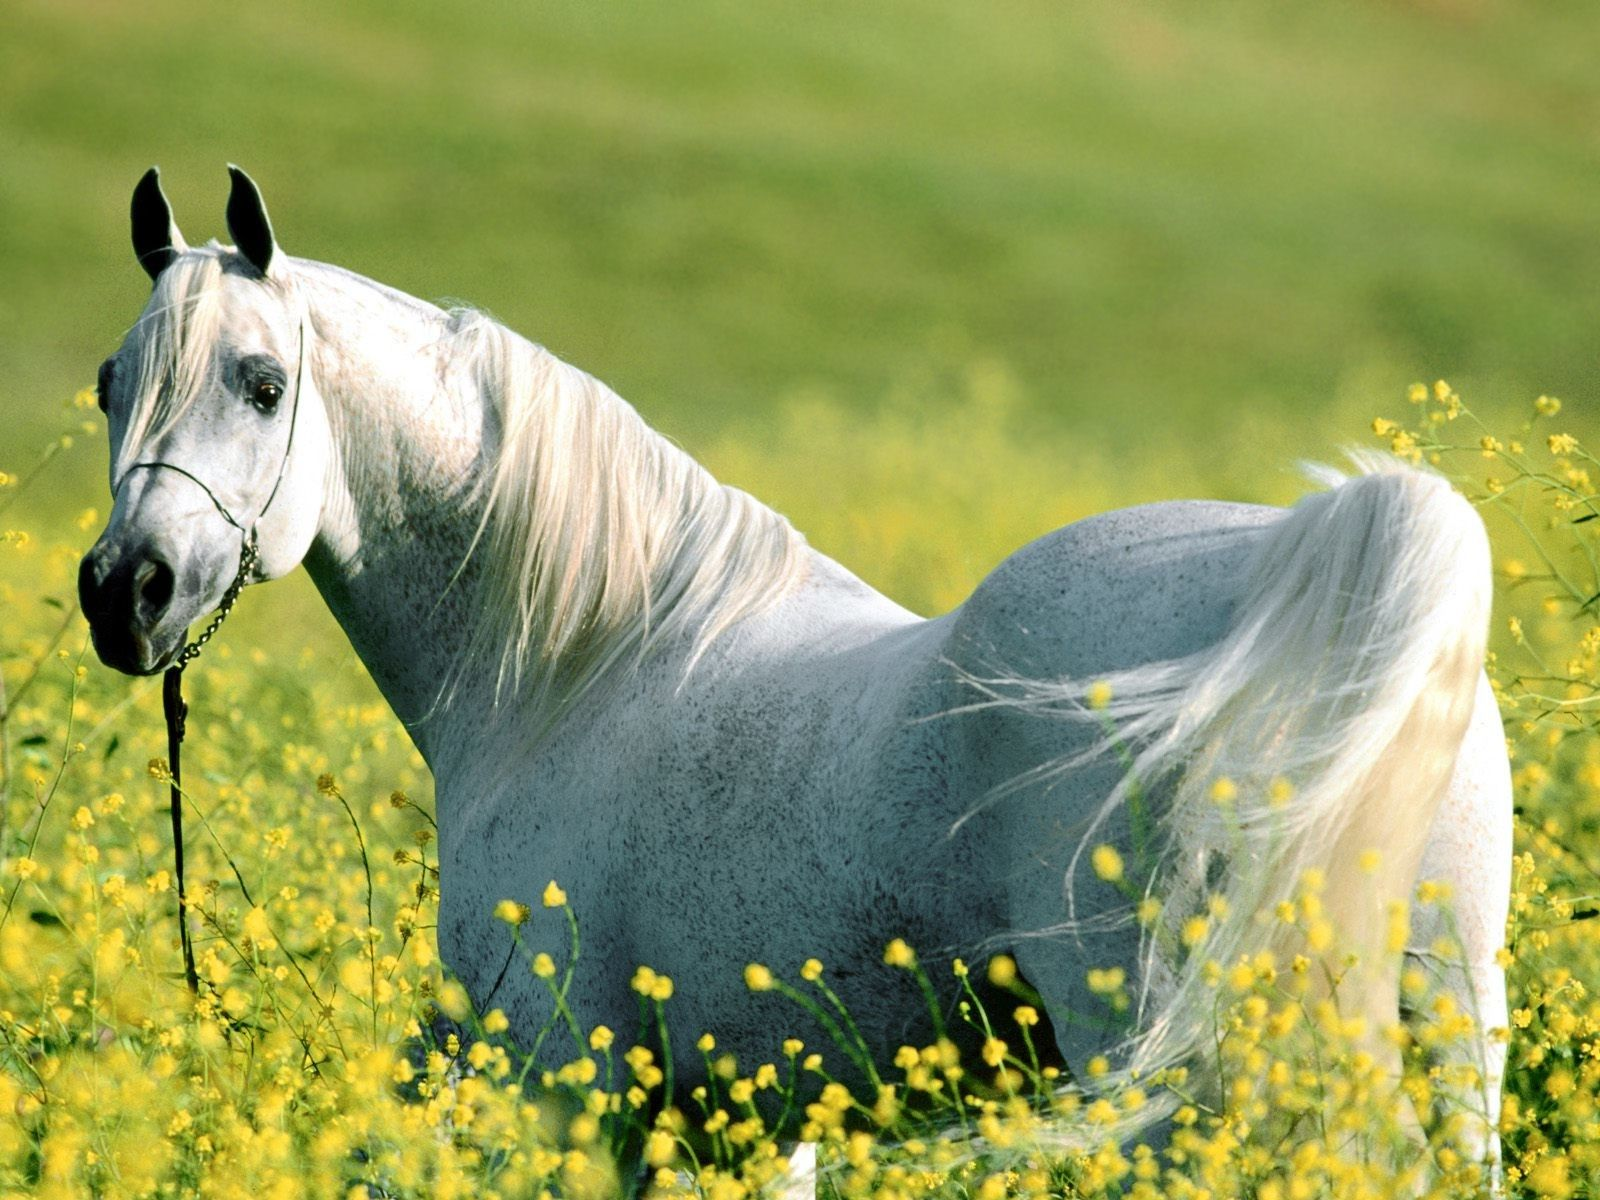 Beautiful Wallpaper Horse Yellow - e784526b924b84eb3bf3c8303f866c8c  Graphic_644964.jpg